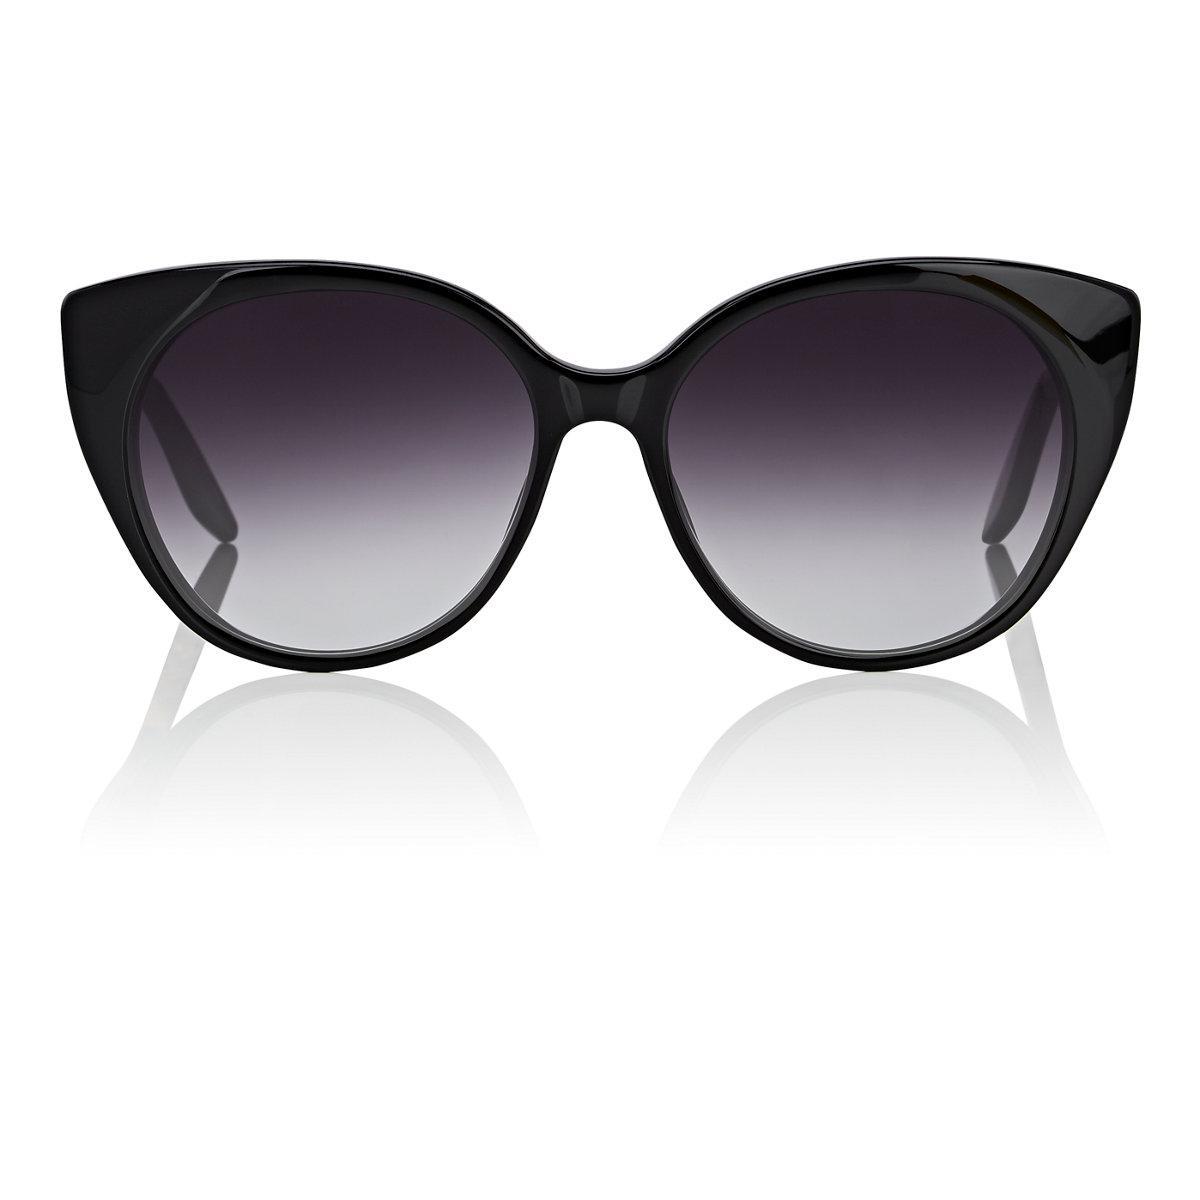 Womens Kuuipo Sunglasses Barton Perreira do6JeXZc2